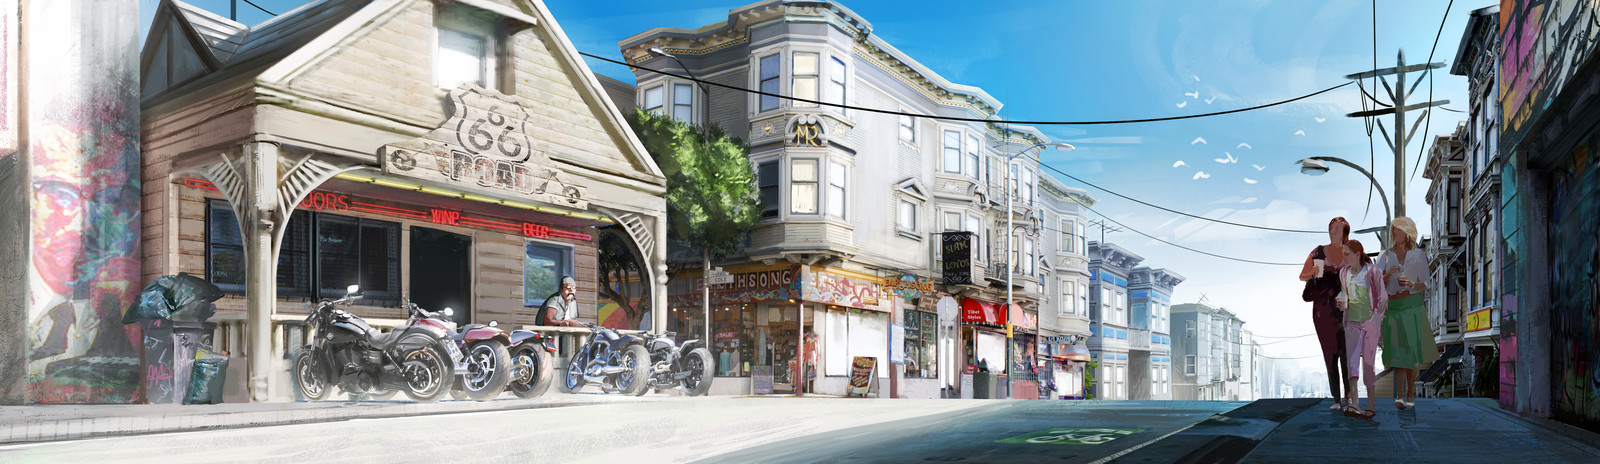 San Francisco Bikers'Bar